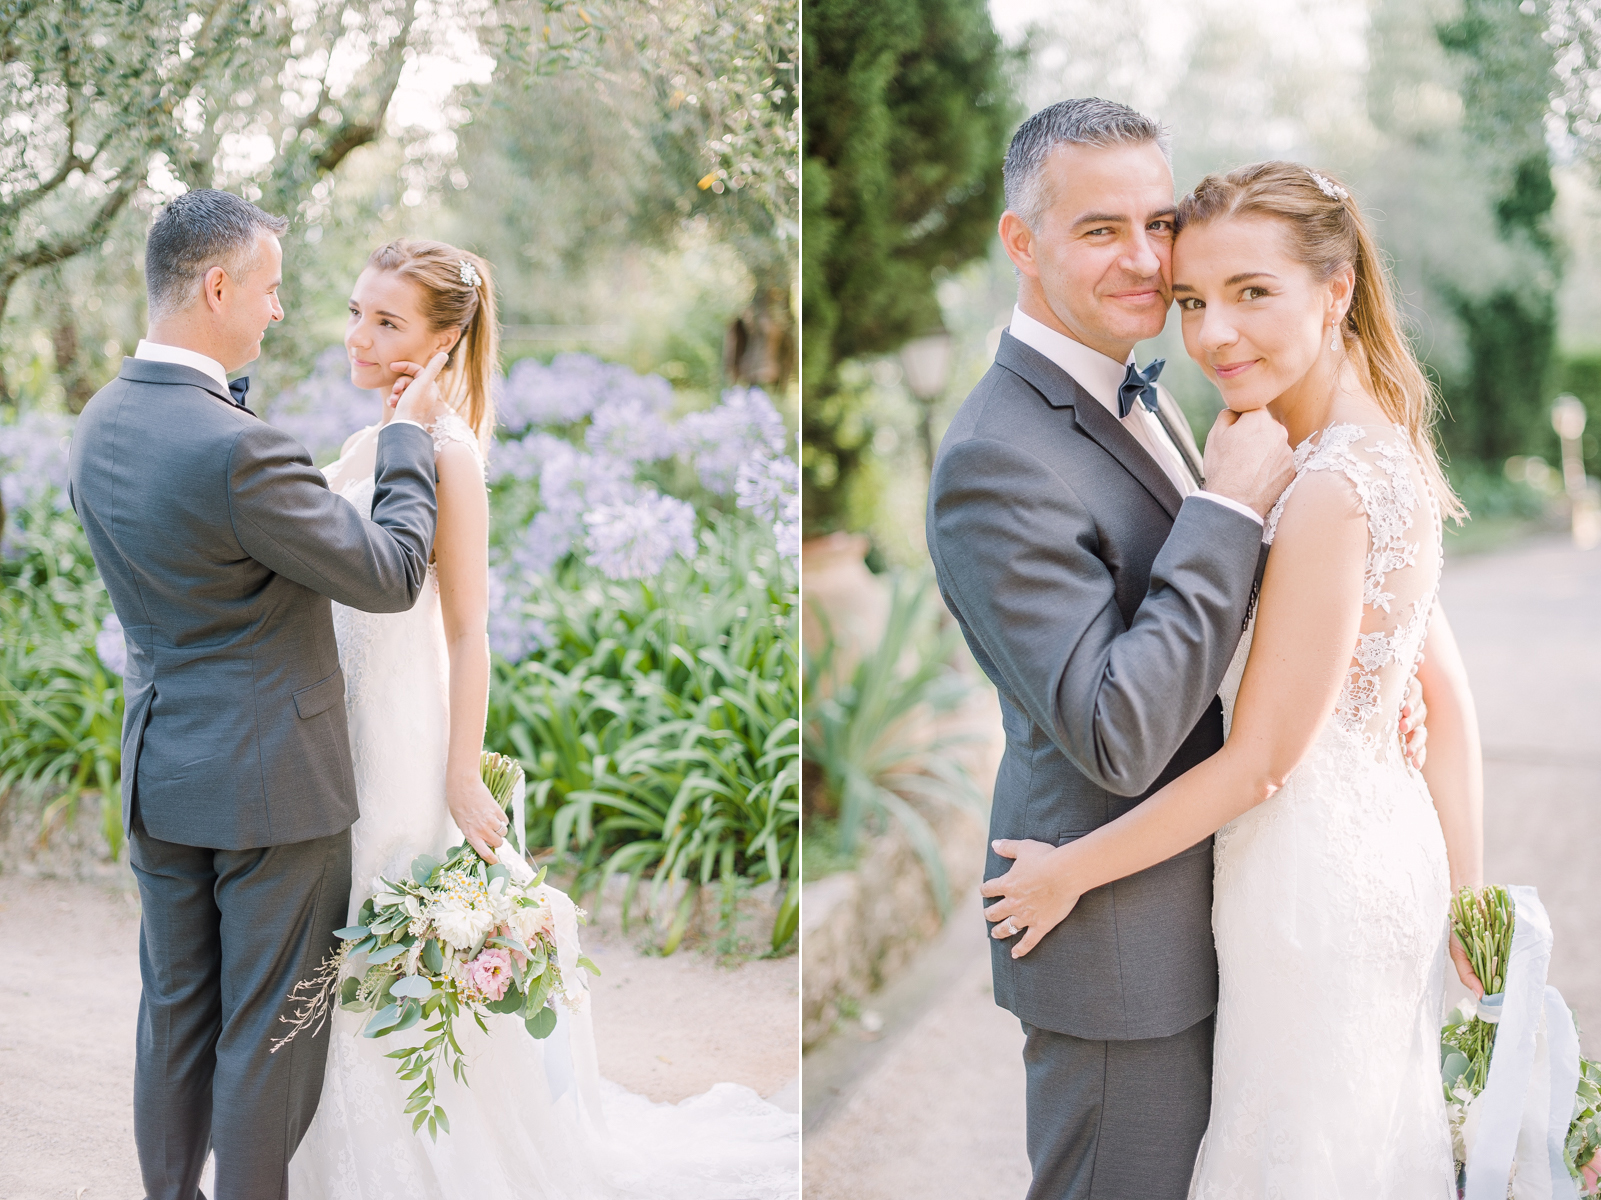 BohemeMoonPhotography-Grasse-provence-wedding-photographer_11.jpg